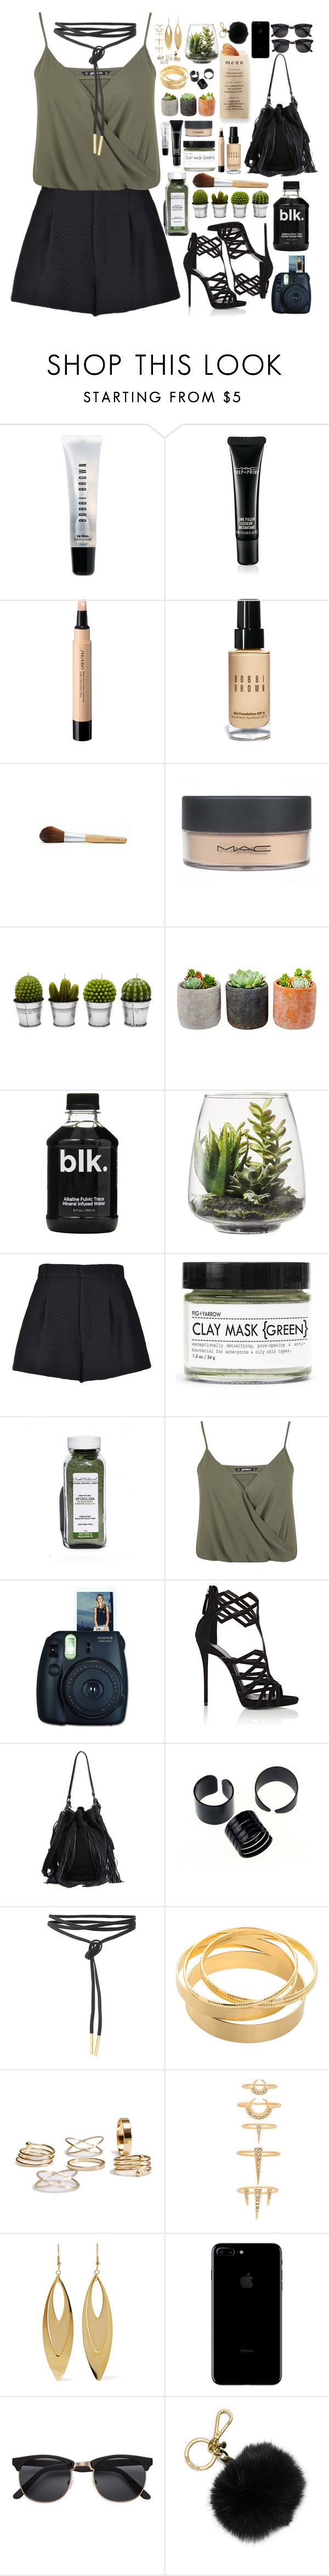 """Essentials"" by tiffy444 ❤ liked on Polyvore featuring Bobbi Brown Cosmetics, MAC Cosmetics, Shiseido, Martha Stewart, Billabong, Shop Succulents, Threshold, RED Valentino, Fig+Yarrow and Miss Selfridge"